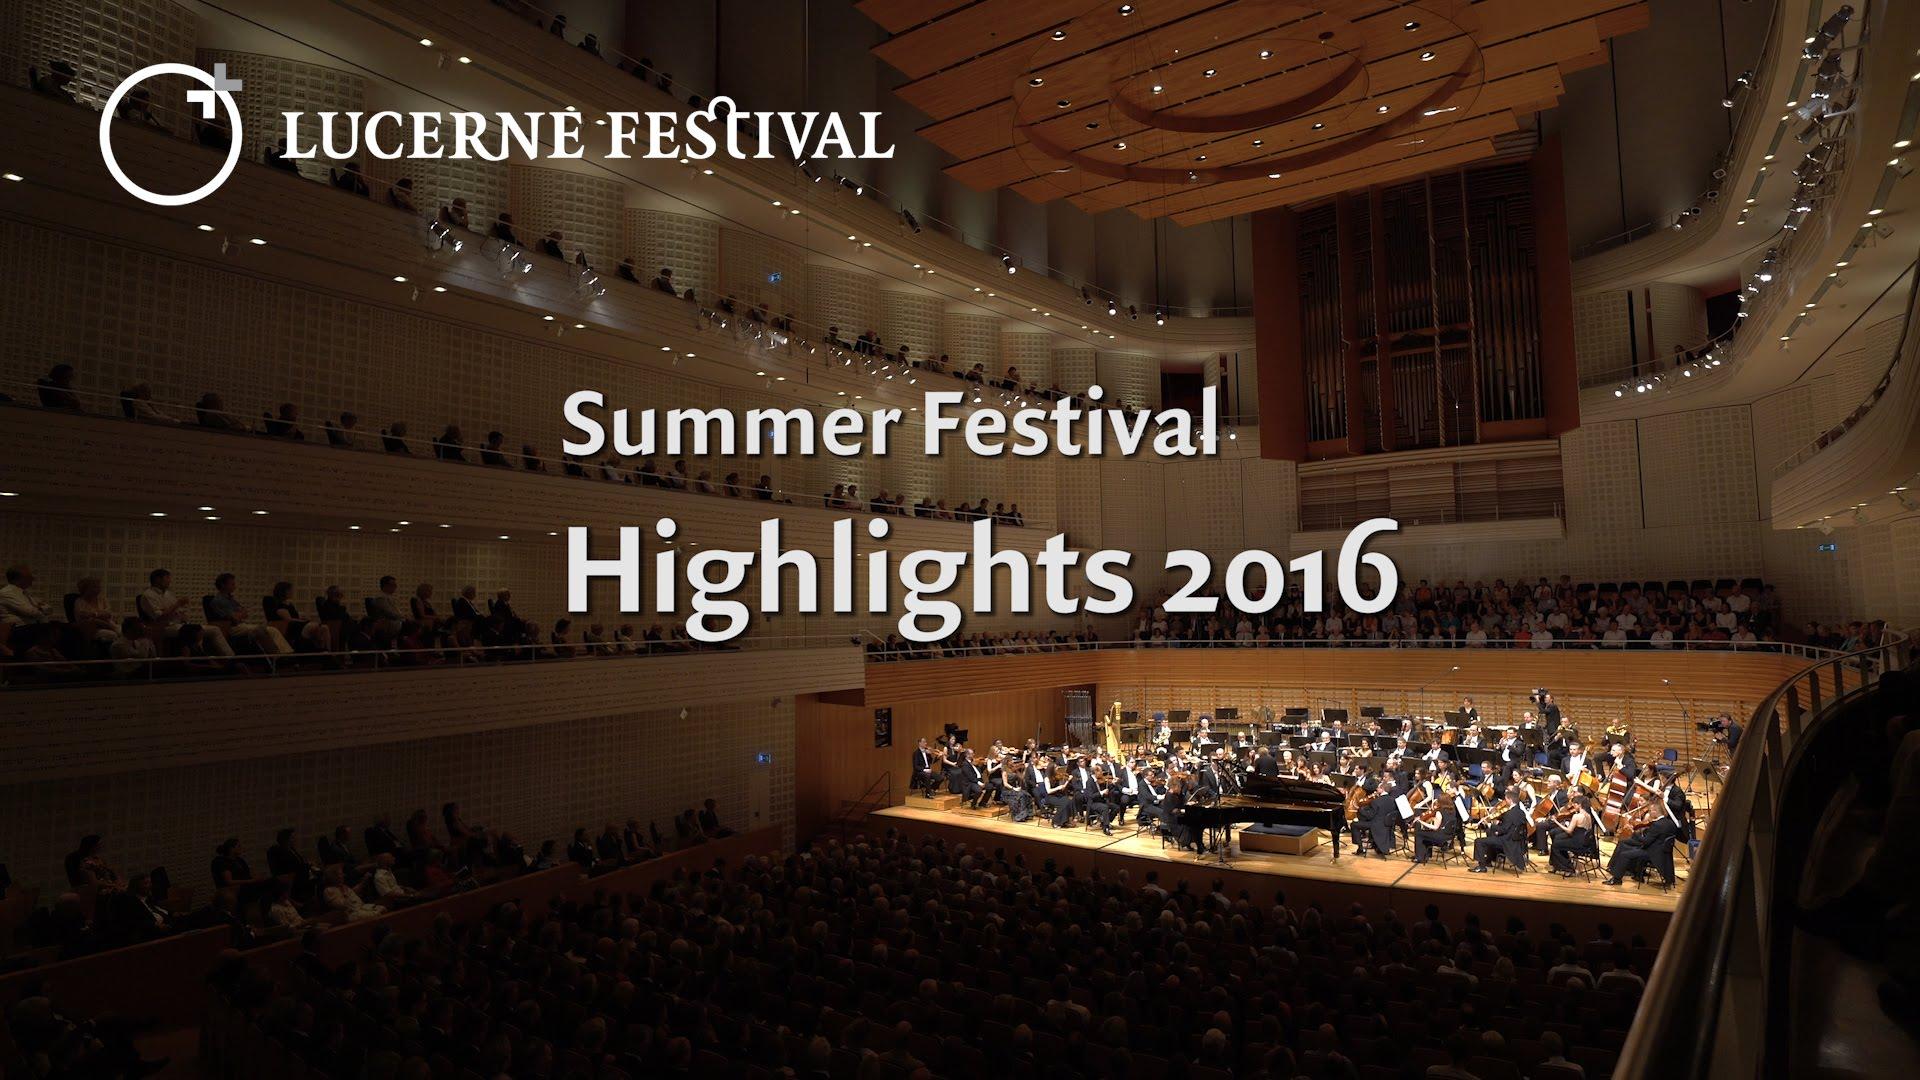 FESTIVAL HIGHLIGHTS: Highlights of Lucerne Festival in Summer 2016